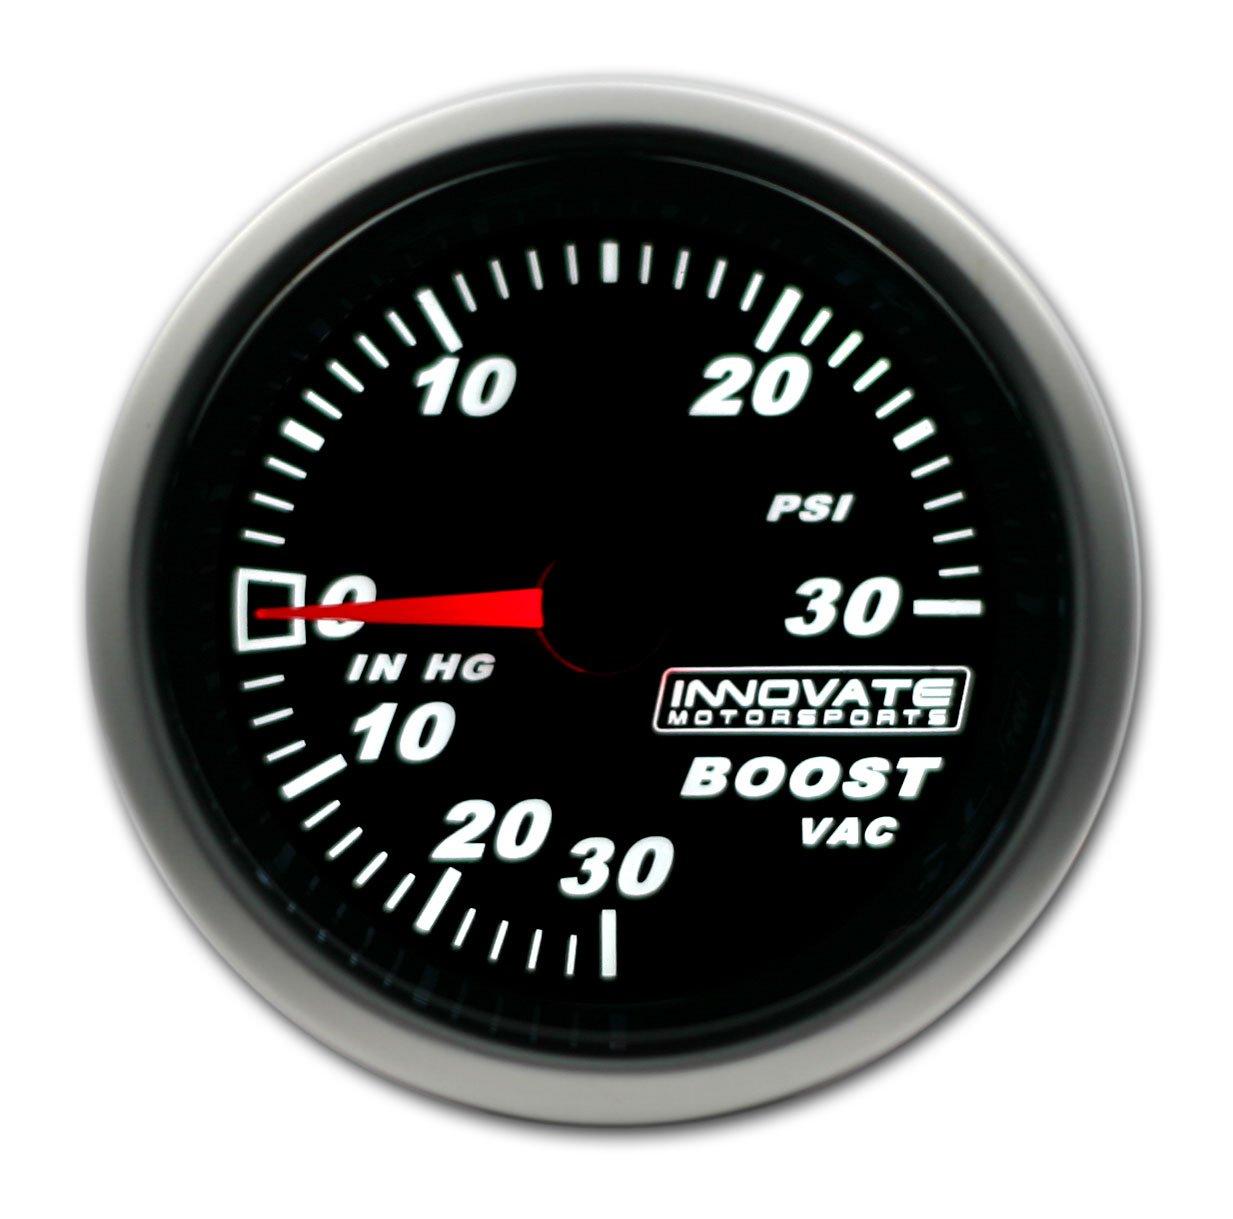 Innovate Motorsports 3816 G3 Vacuum/Boost Gauge Kit (2-1/16 52mm) Mechanical